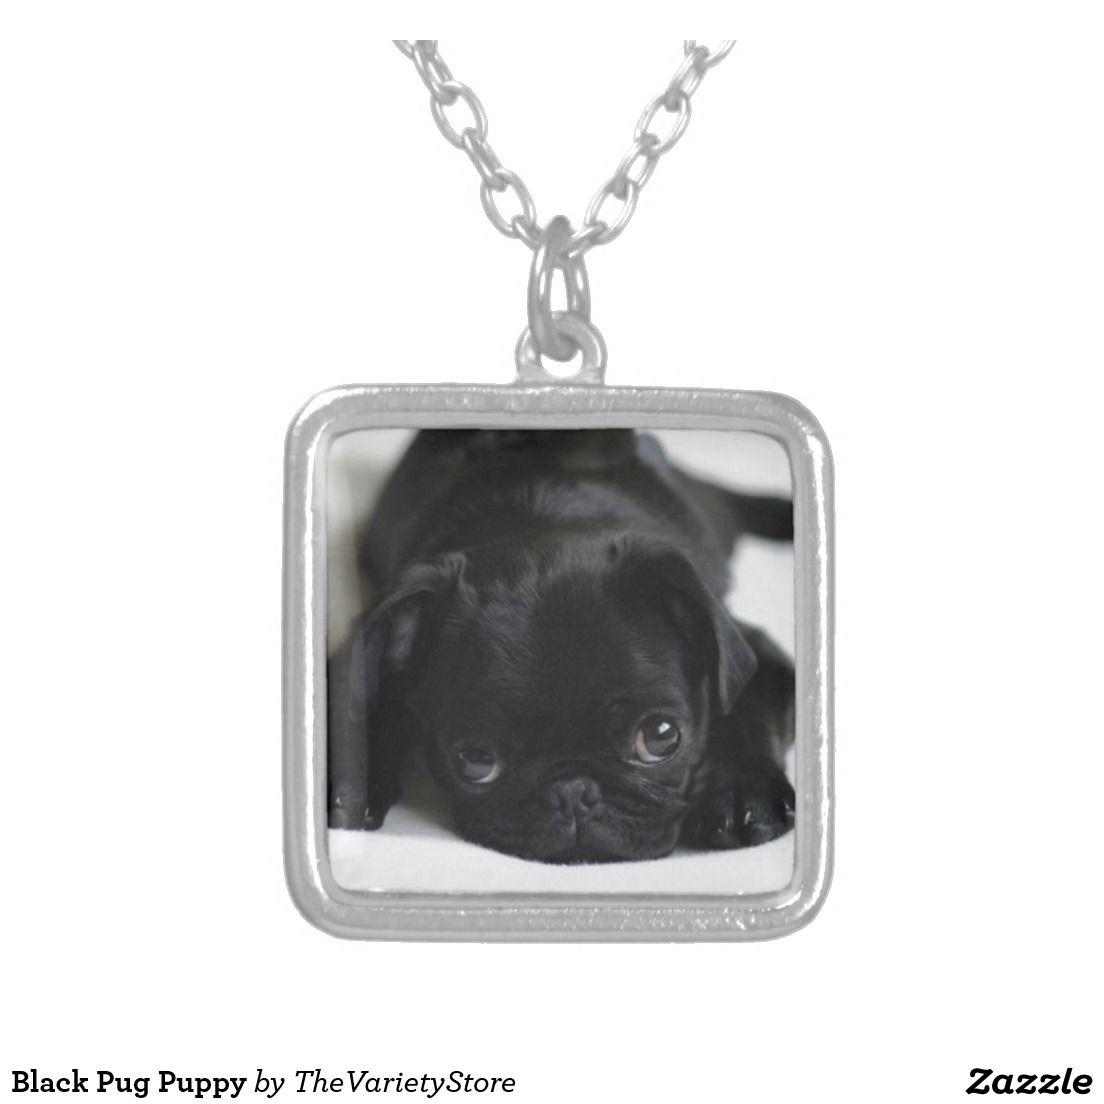 Black pug puppy silver plated necklace black pug puppy black pug